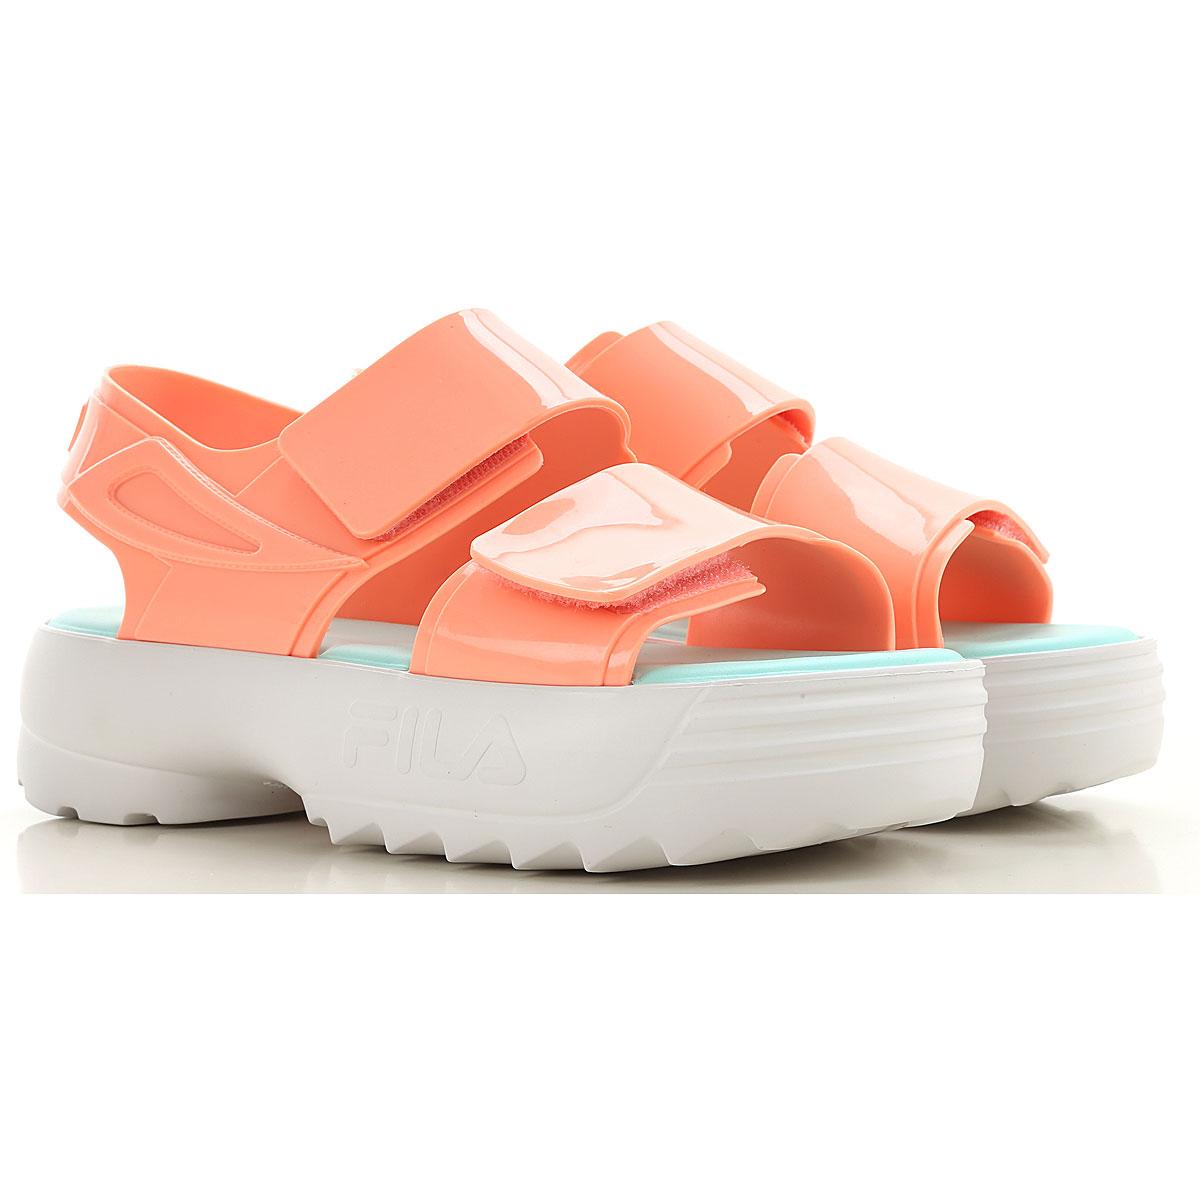 Melissa Sandals for Women On Sale, Light Salmon Pink, PVC, 2019, USA 7 - EUR 38 USA 8 - EUR 39 USA 9 - EUR 40 USA 10 - EUR 41/42